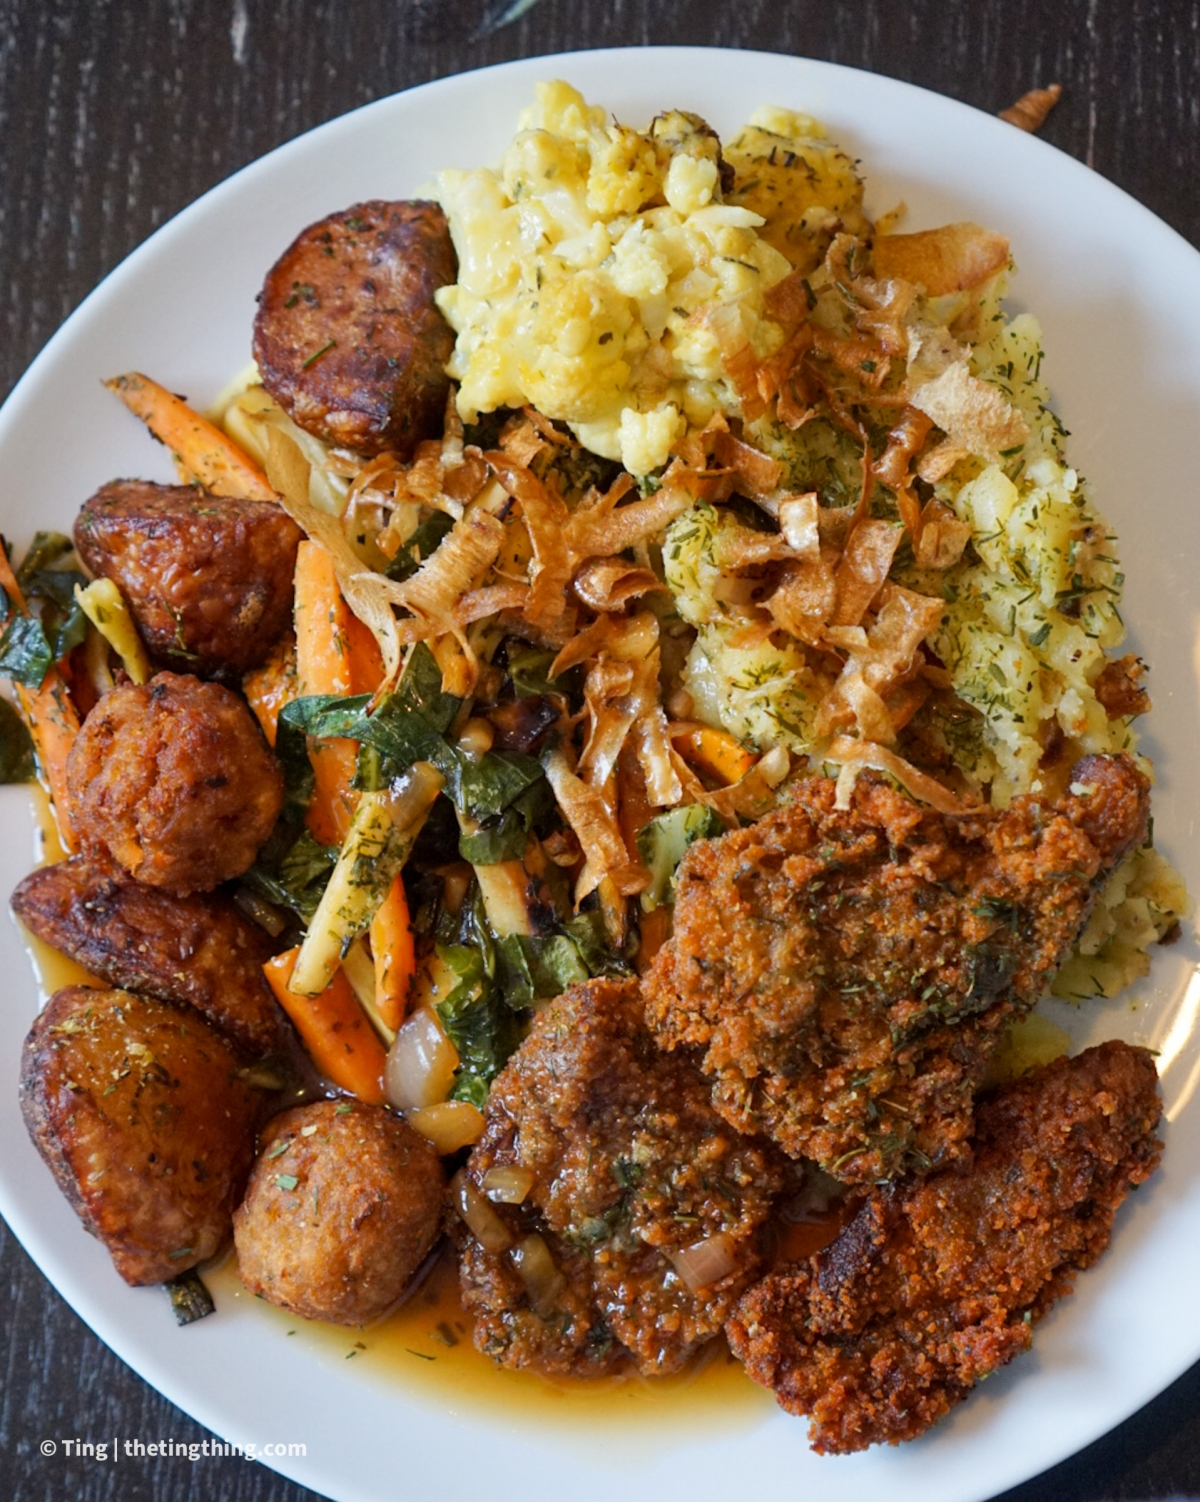 BaHa king of roasts plated